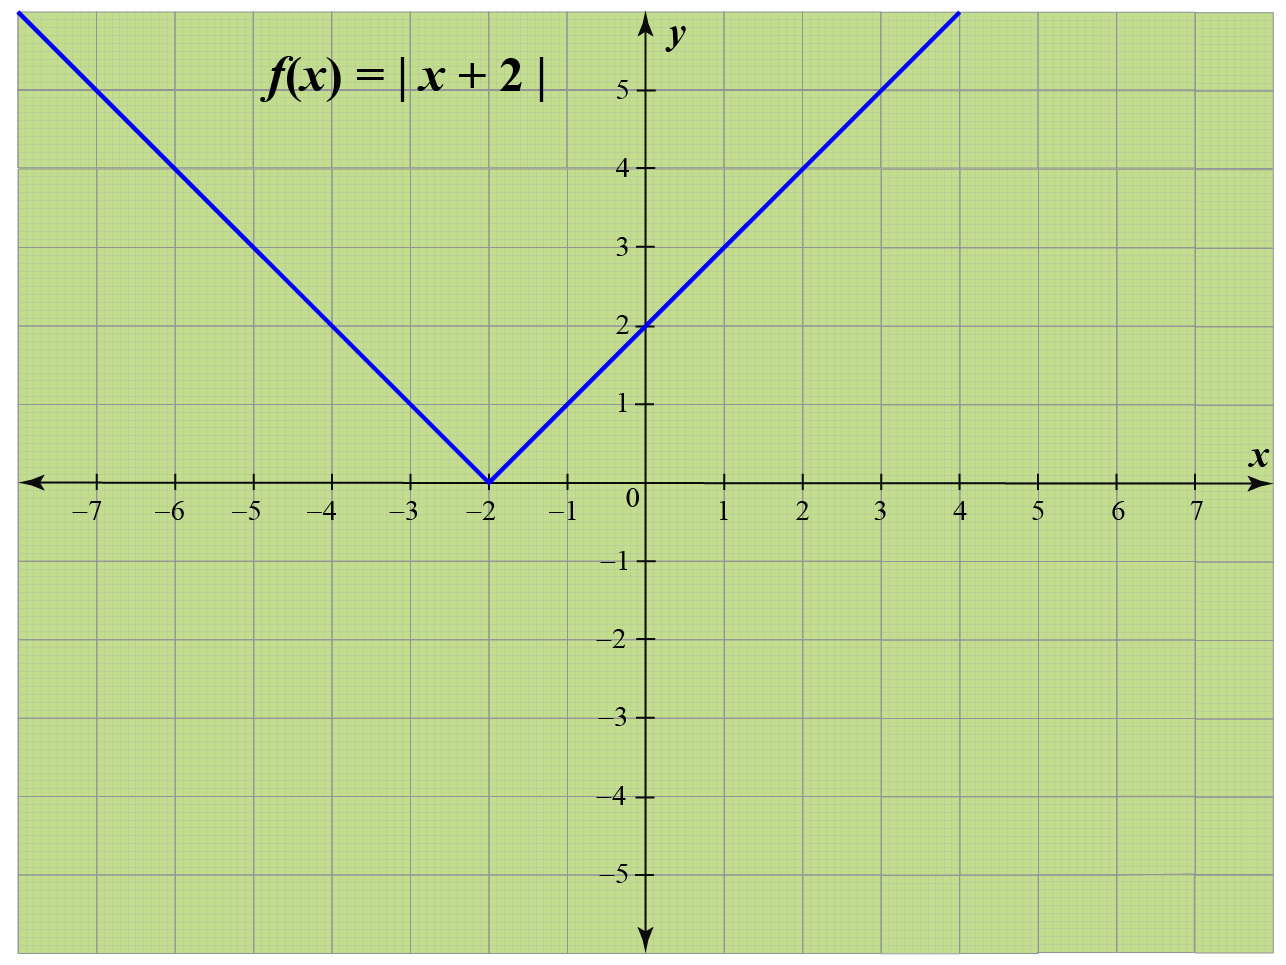 Modulus graph of x+2